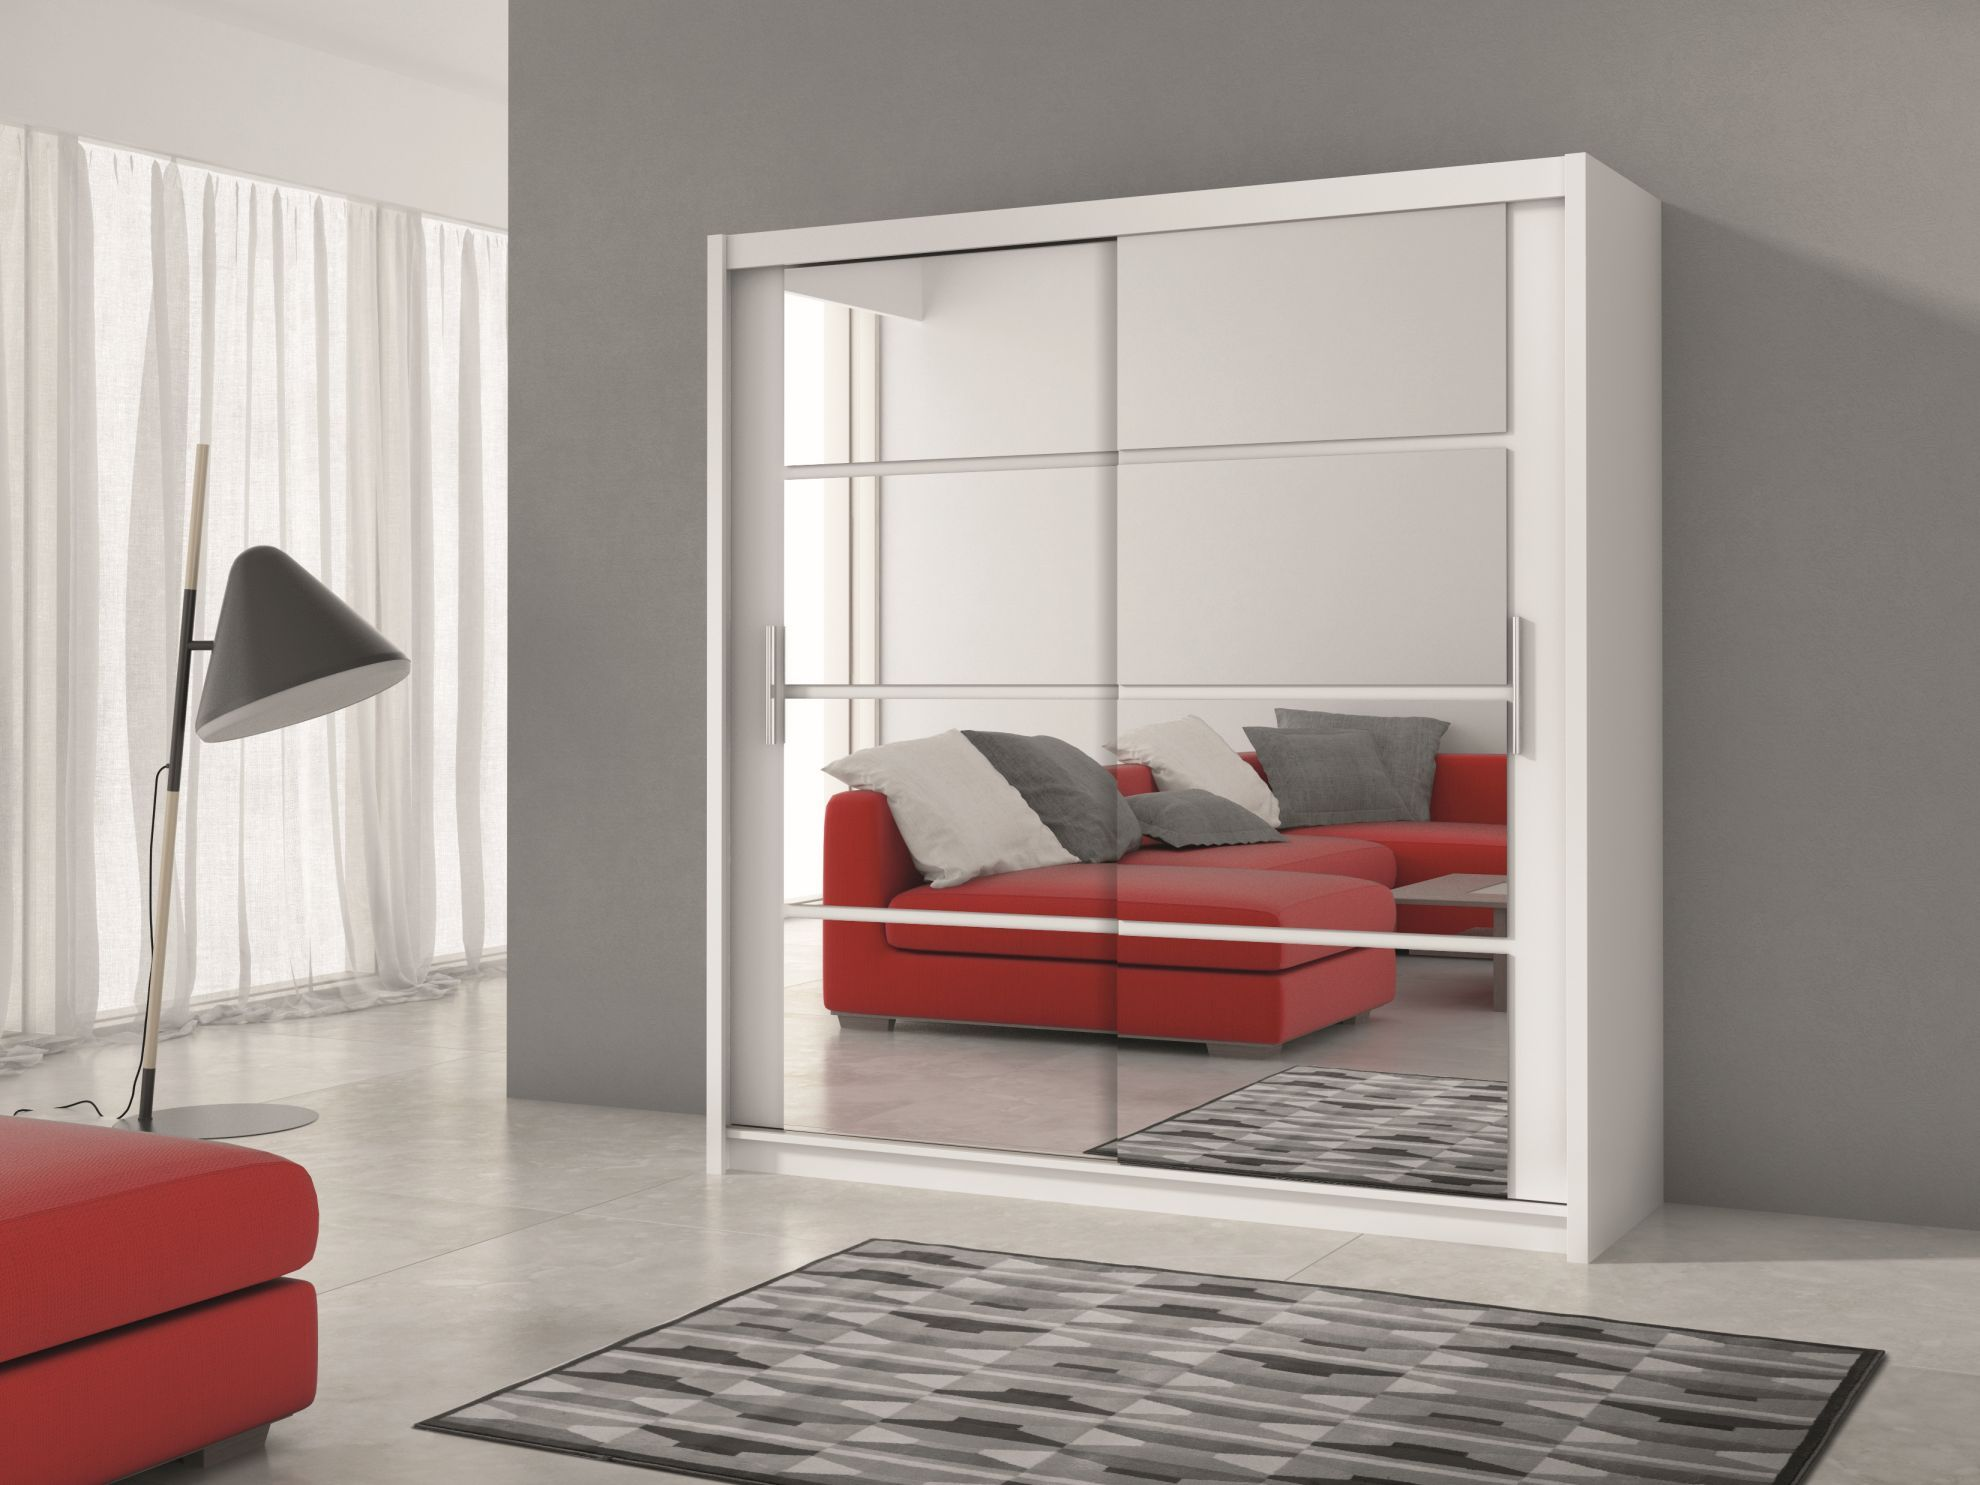 Hallway furniture oak Derby   White wardrobe with mirror  Hall console table Hall